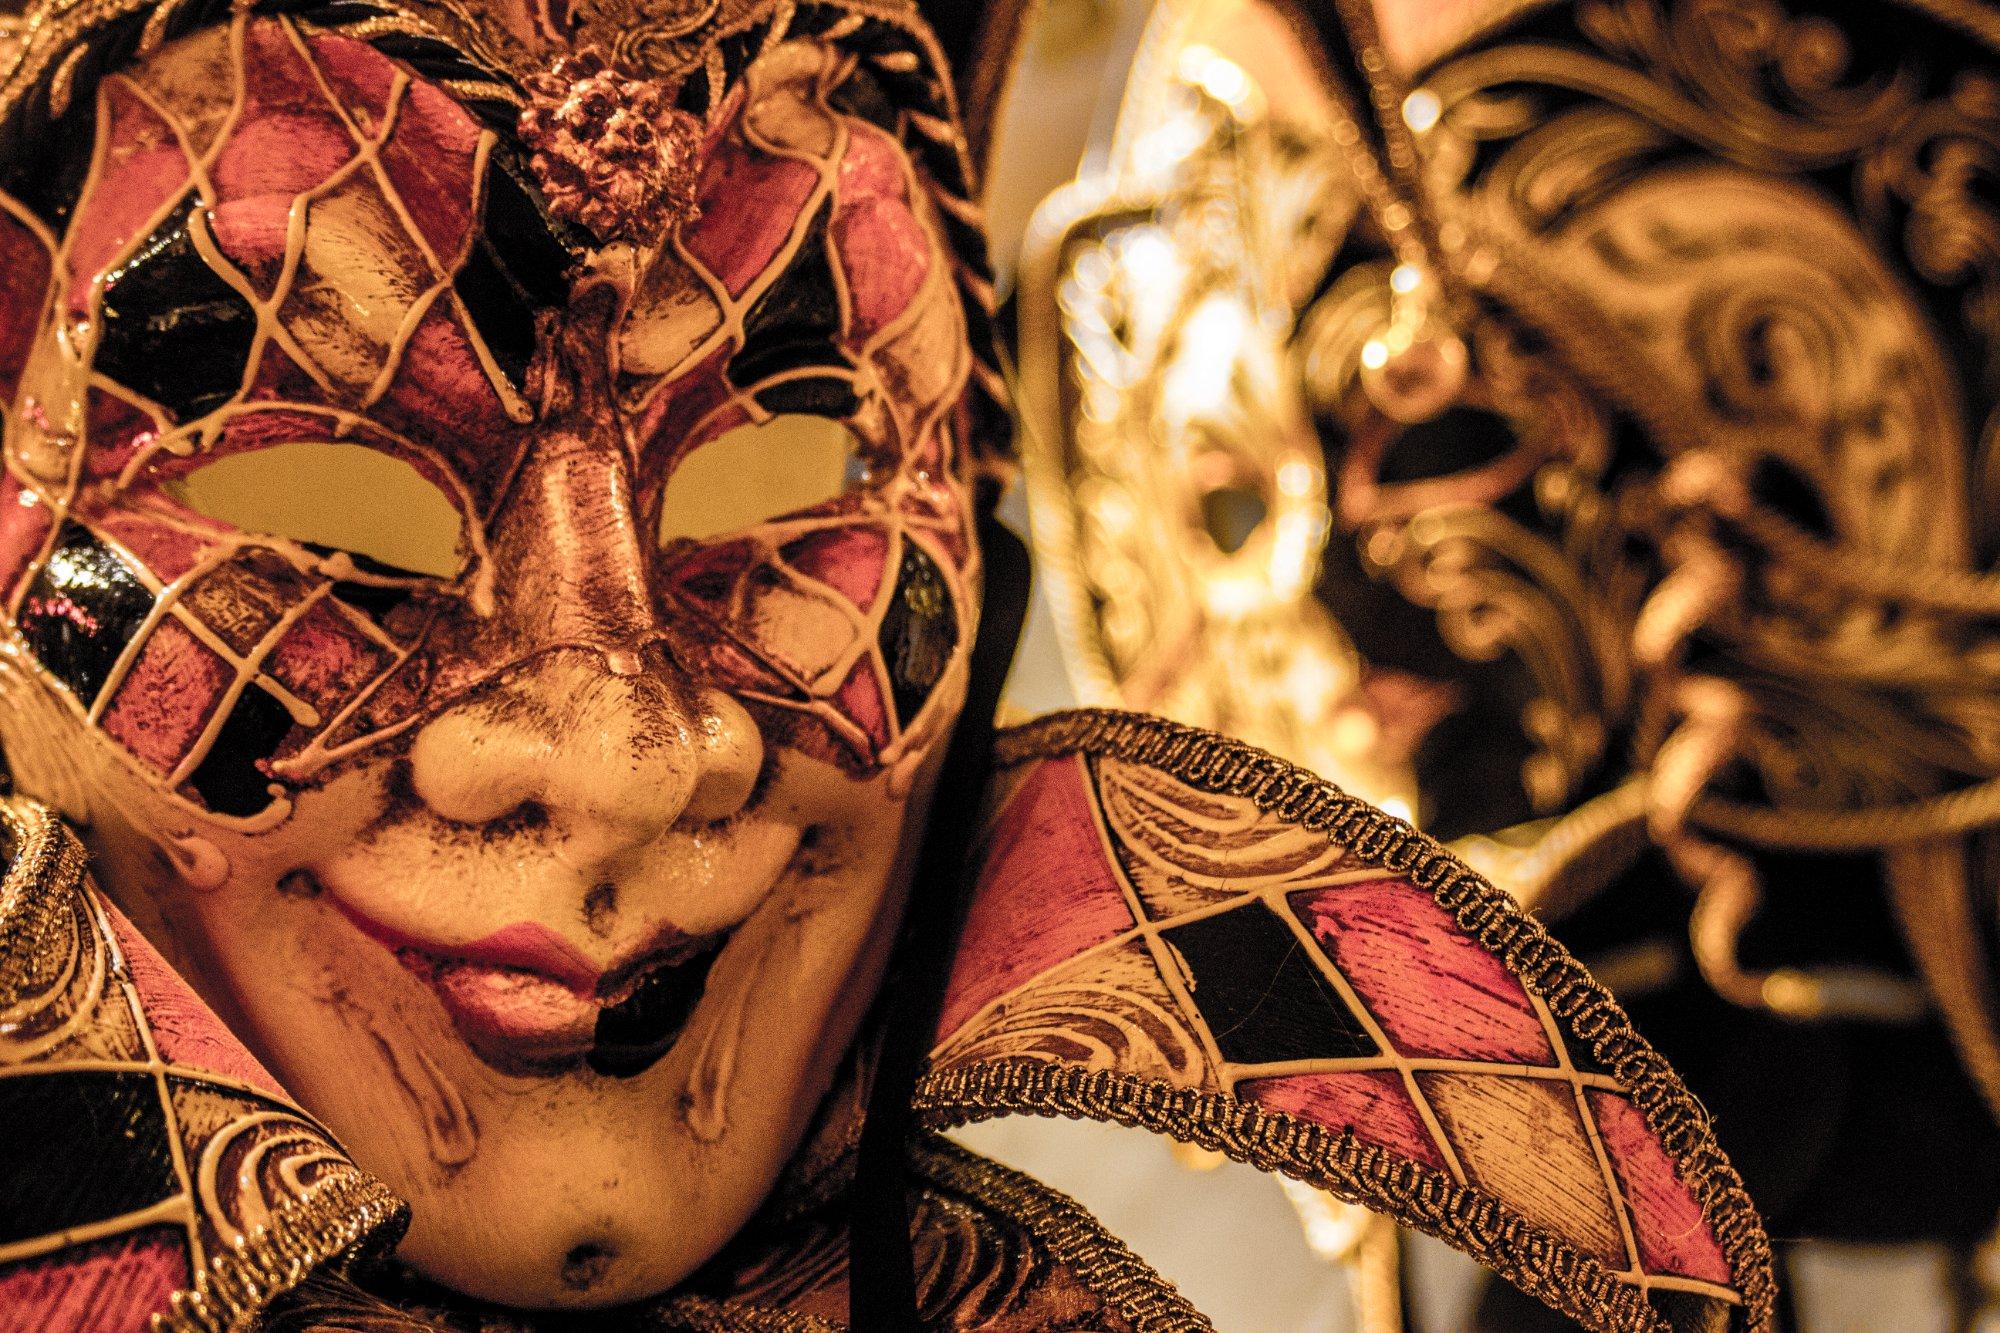 An amazing mask shop